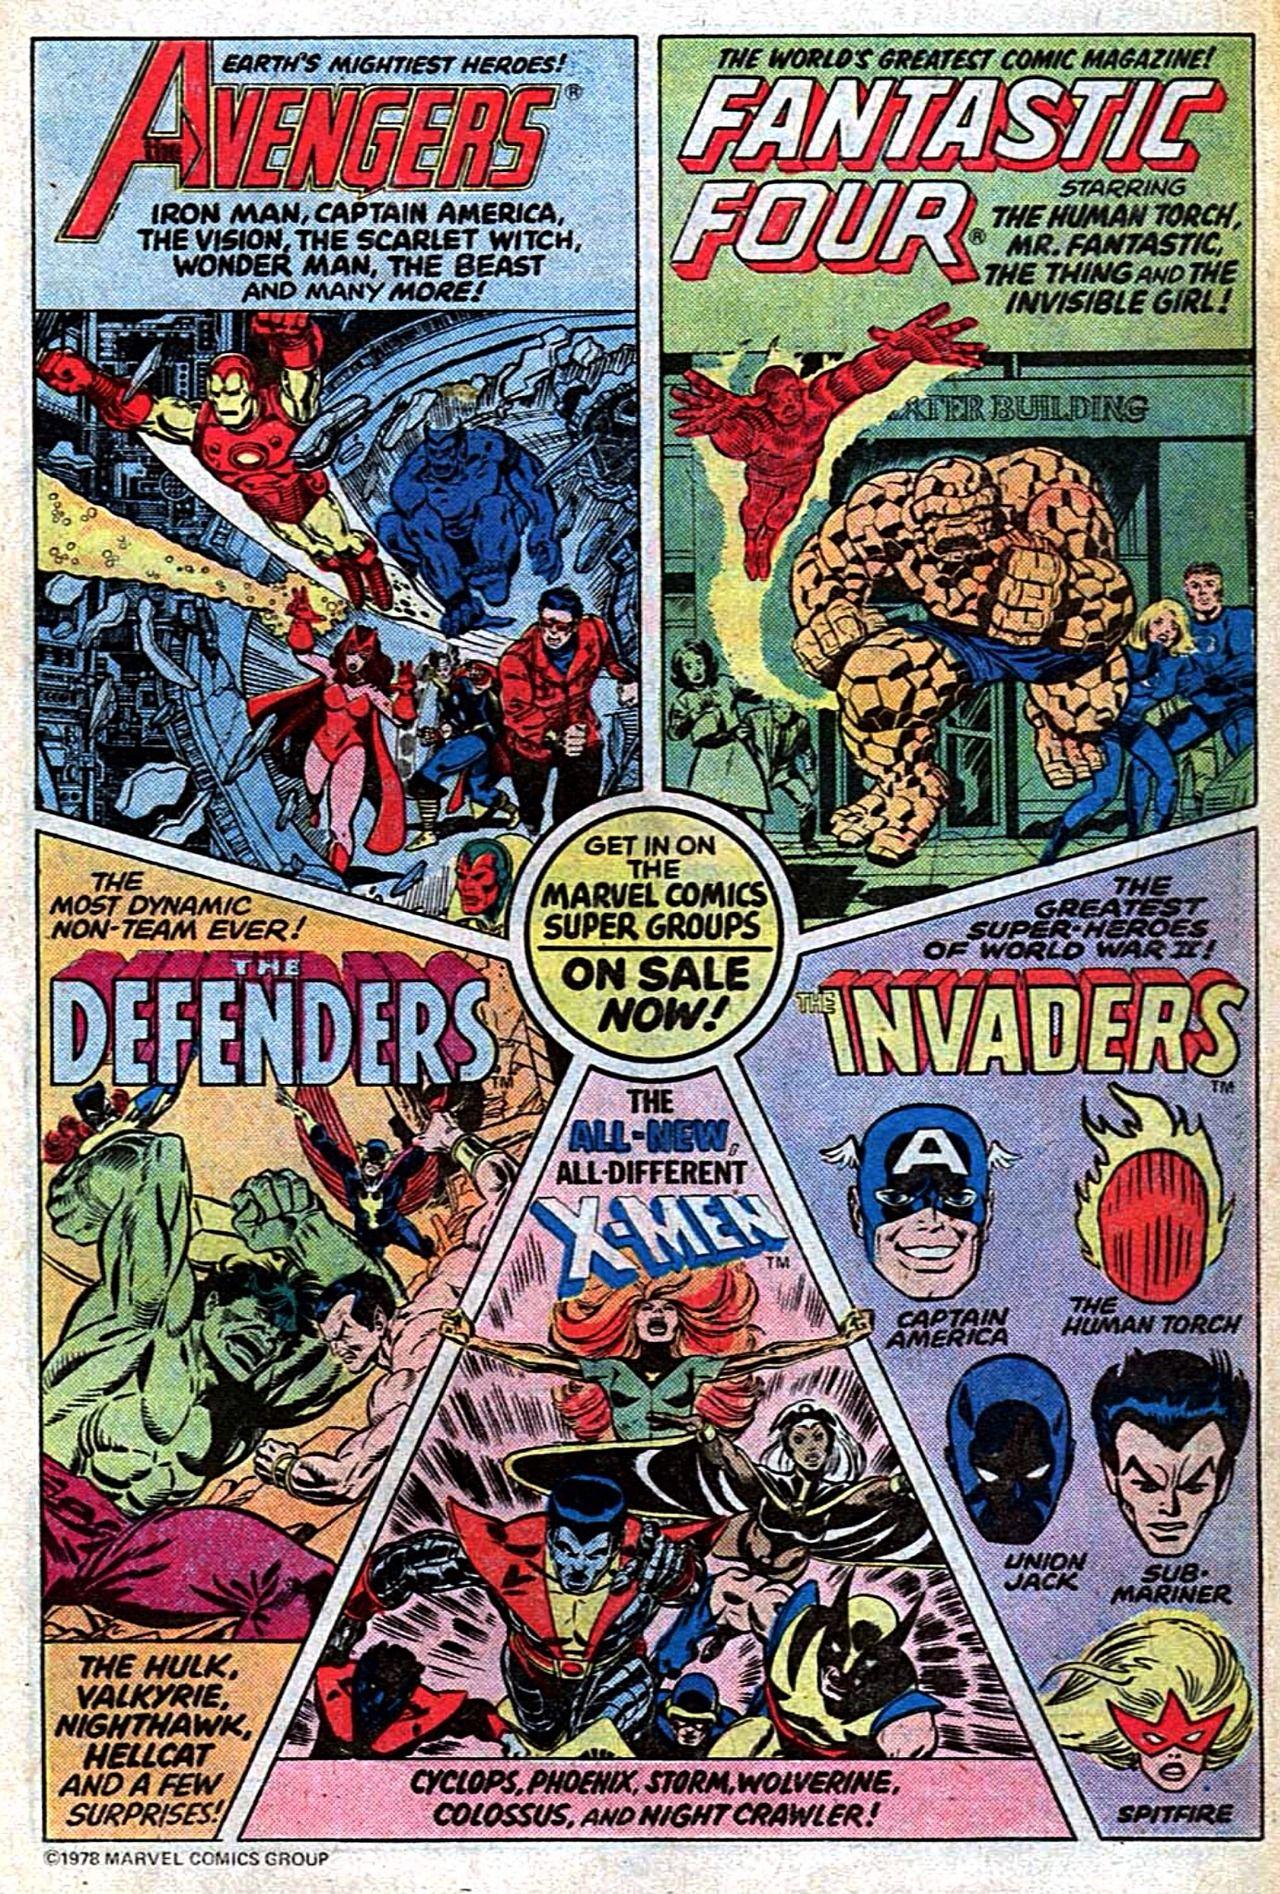 Marvel Comics 1970s house ads | Marvel comics superheroes, Comic book  heroes, Spiderman comic books